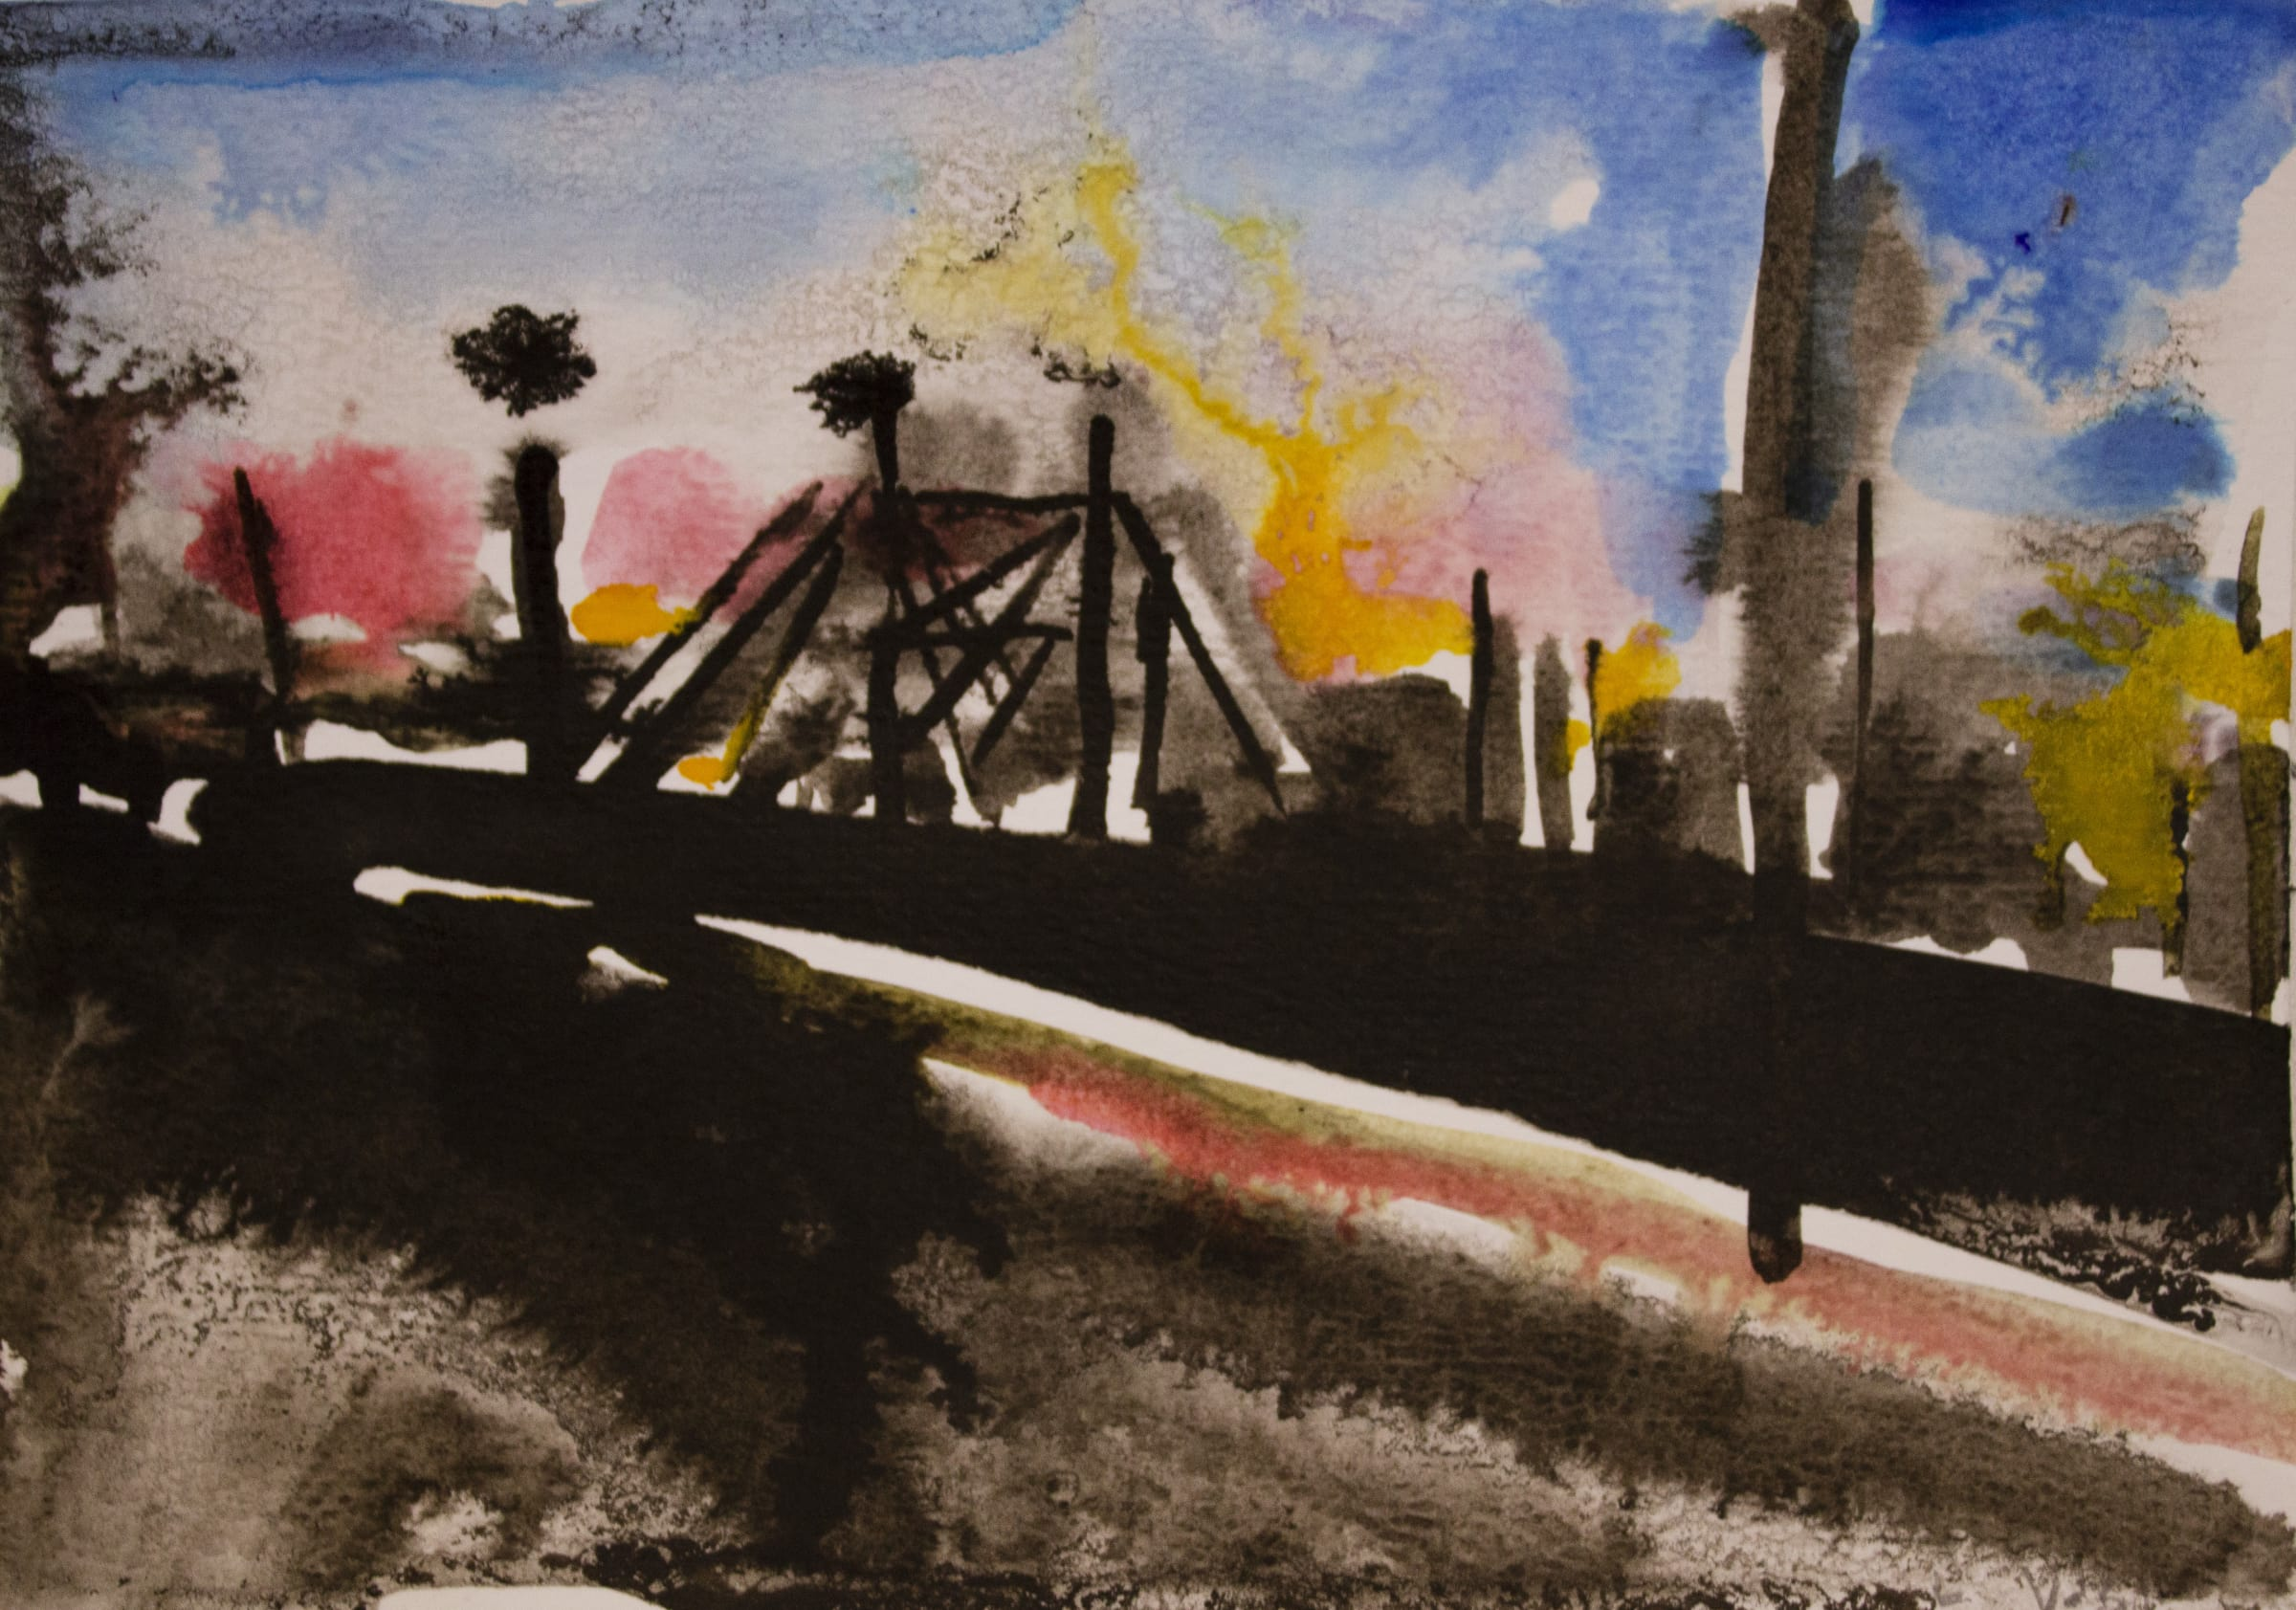 <span class=&#34;link fancybox-details-link&#34;><a href=&#34;/artists/88-louise-van-der-bijl/works/2292-louise-van-der-bijl-inktober-day-29-2018/&#34;>View Detail Page</a></span><div class=&#34;artist&#34;><strong>Louise Van Der Bijl</strong></div> <div class=&#34;title&#34;><em>Inktober Day 29</em>, 2018</div> <div class=&#34;medium&#34;>Ink On Paper</div> <div class=&#34;dimensions&#34;>15cm x 21cm</div><div class=&#34;price&#34;>R400.00</div>